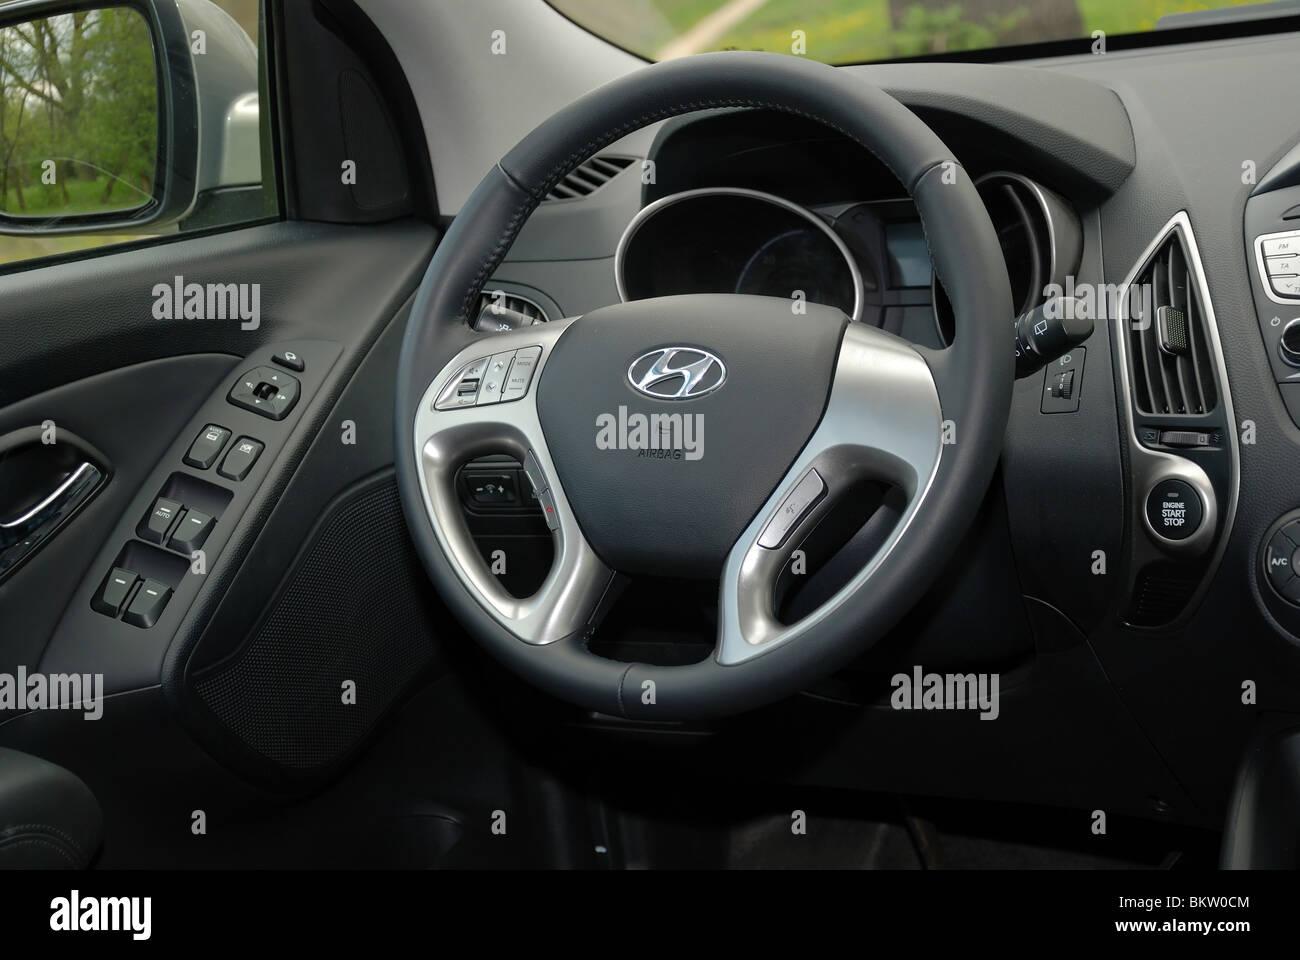 Hyundai ix35 2.0 CRDi 4 x 4 - 2010 - koreanische kompakte SUV ...